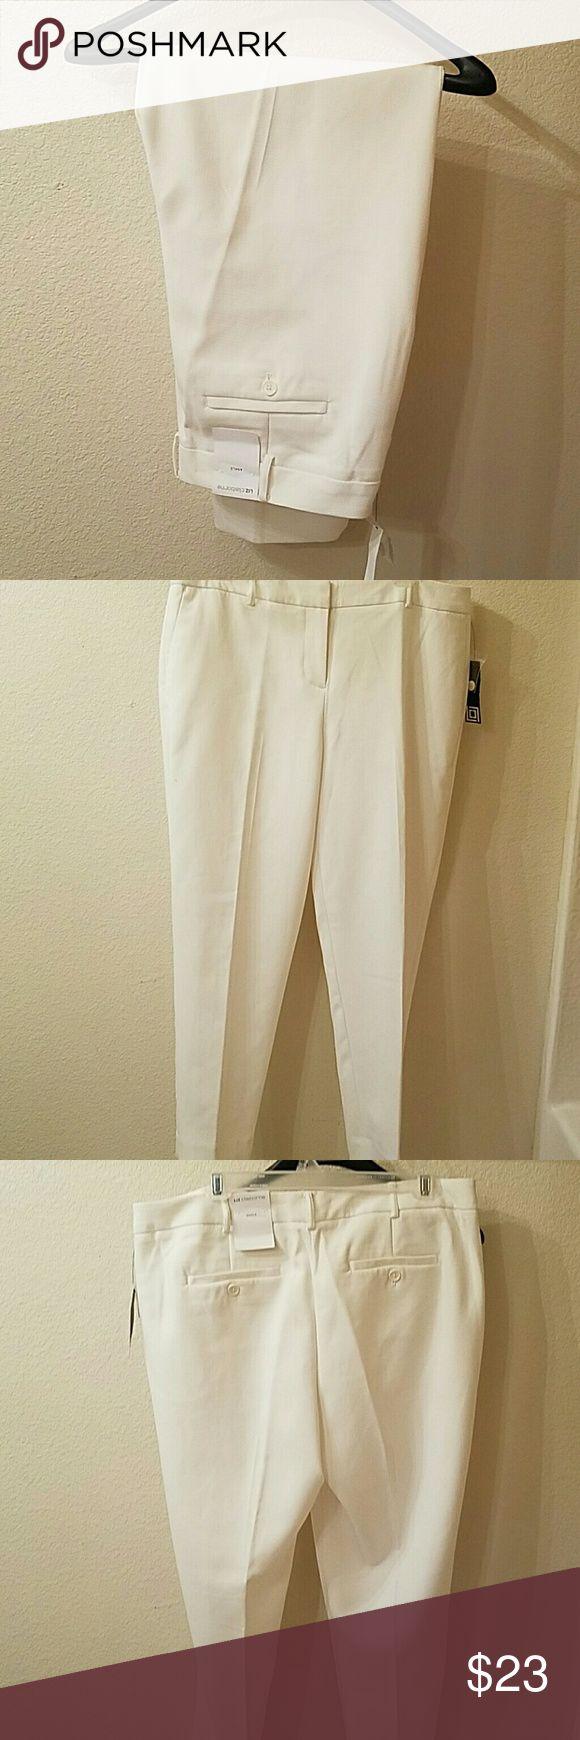 Liz Claiborne Marshmallow size 12 ankle pants Liz Claiborne new size 12 ankle pants Liz Claiborne Pants Ankle & Cropped